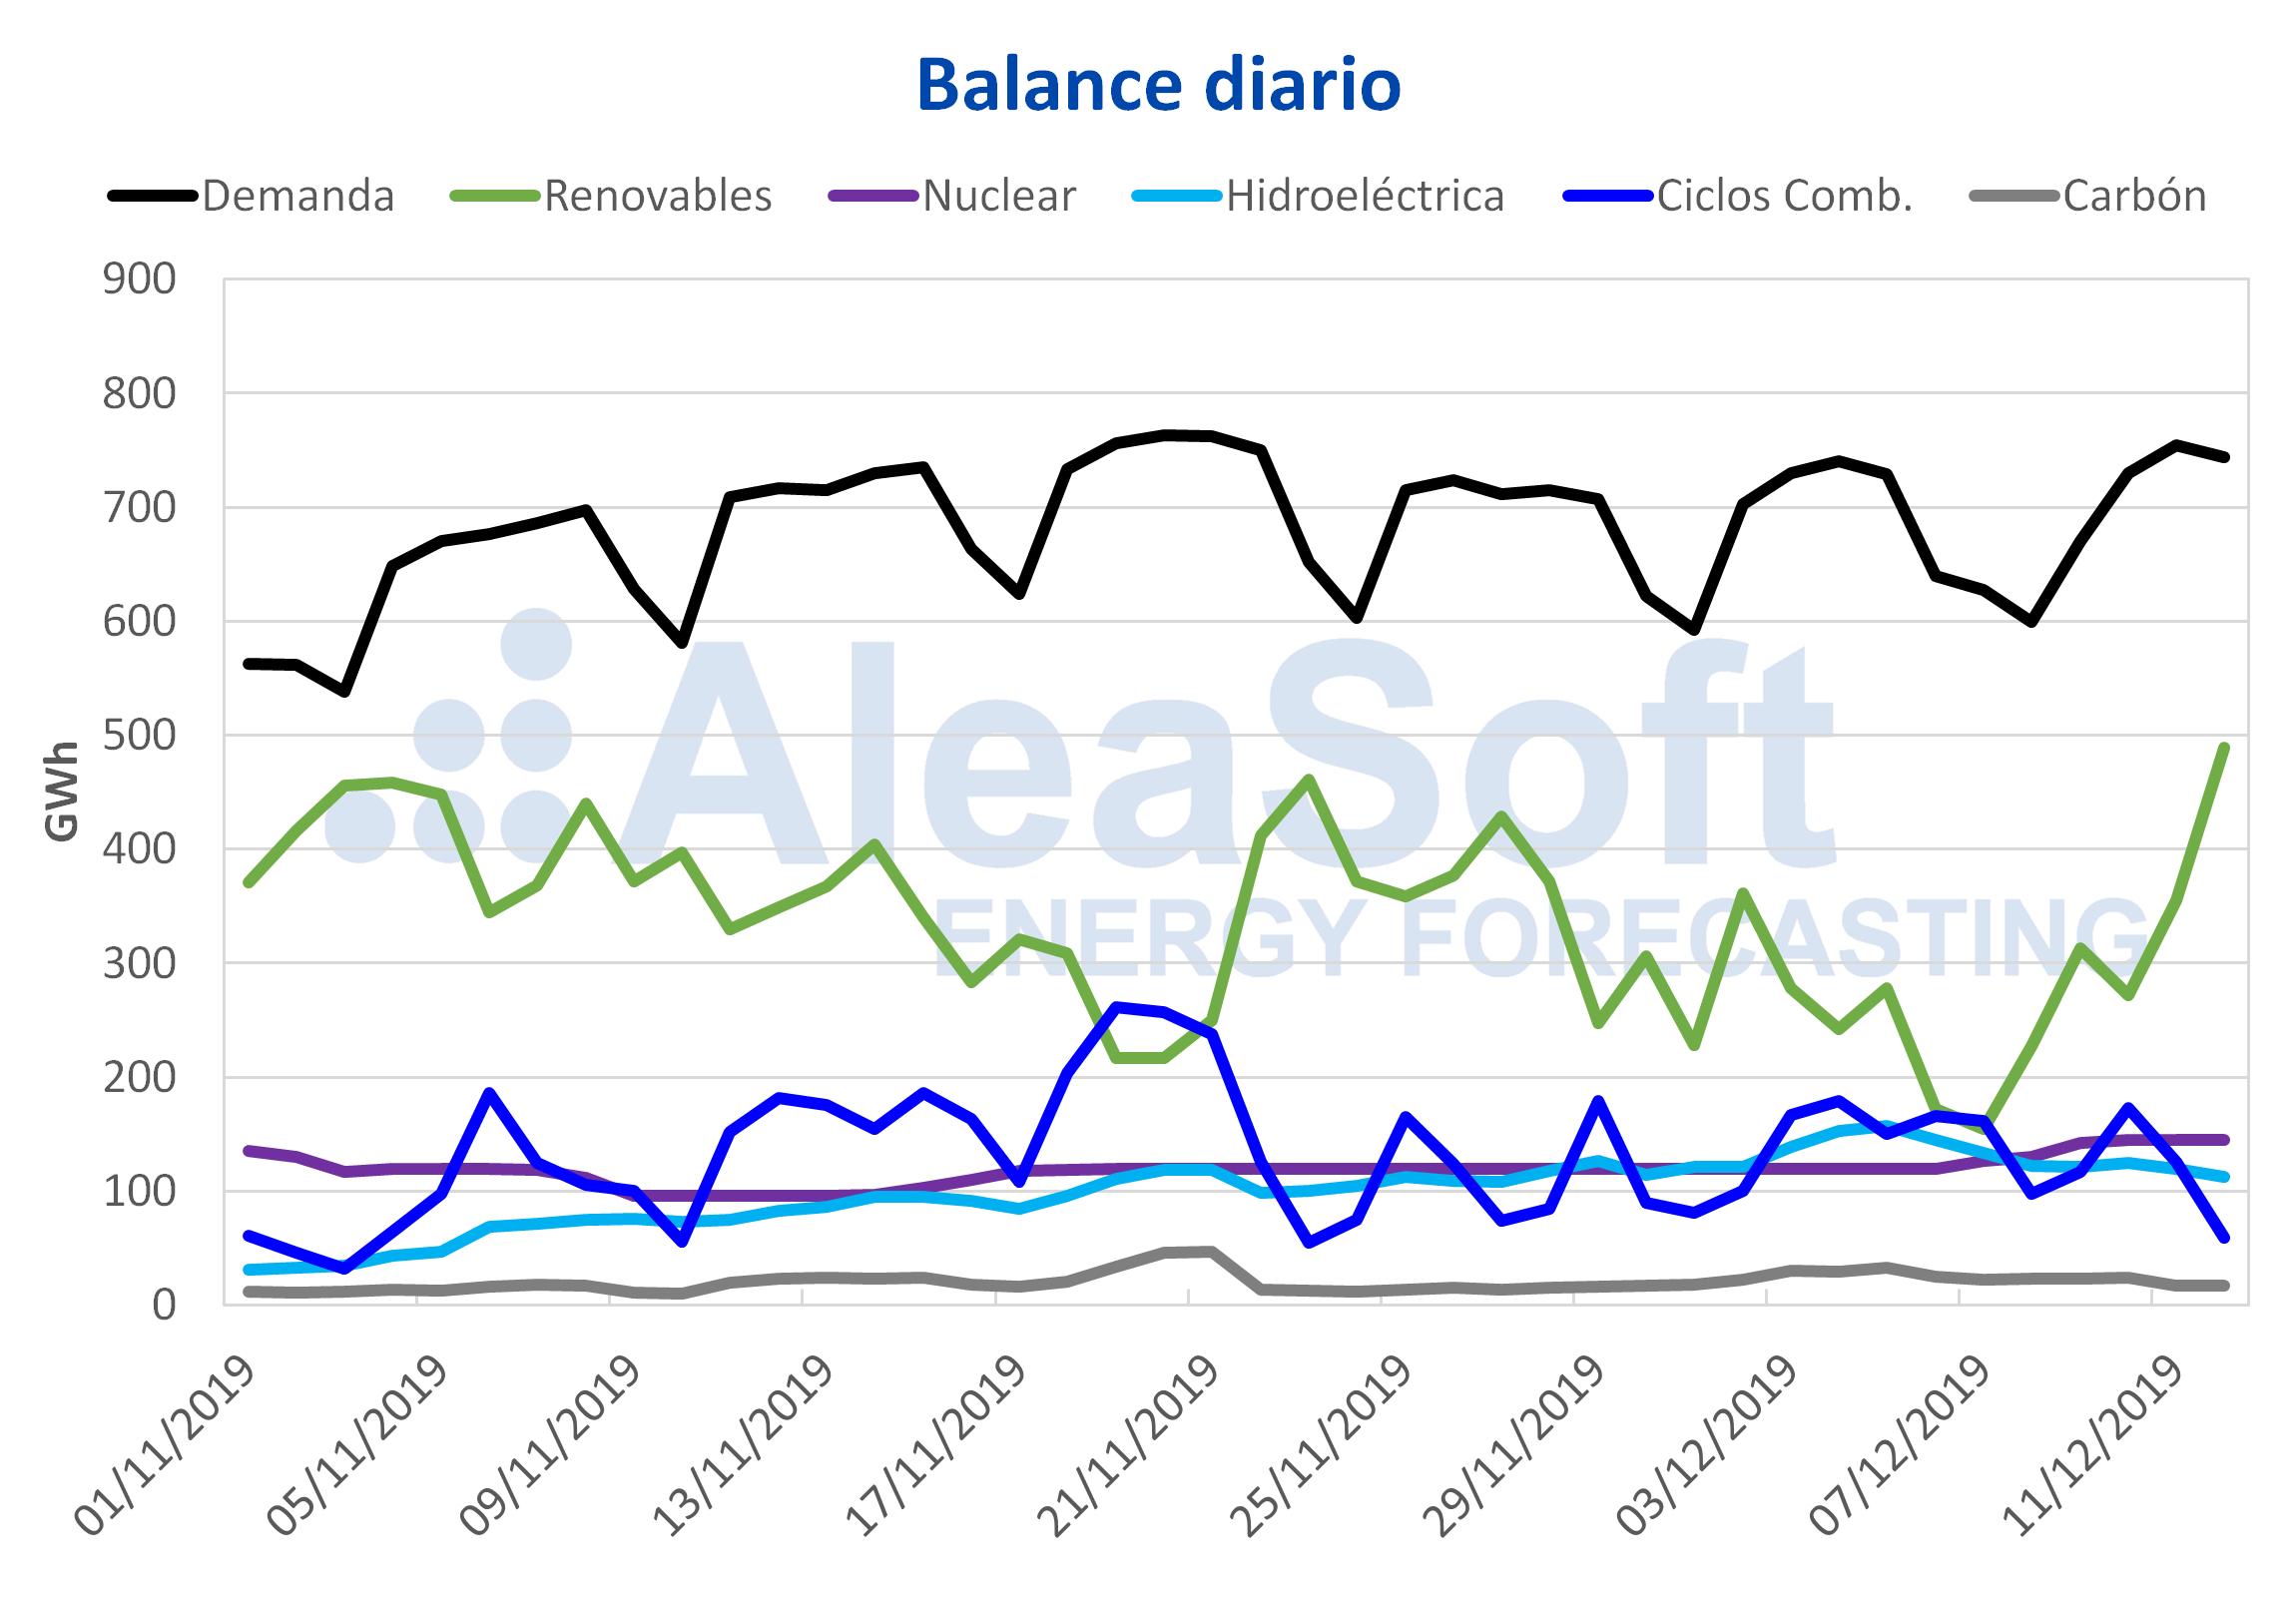 AleaSoft - Balance diario